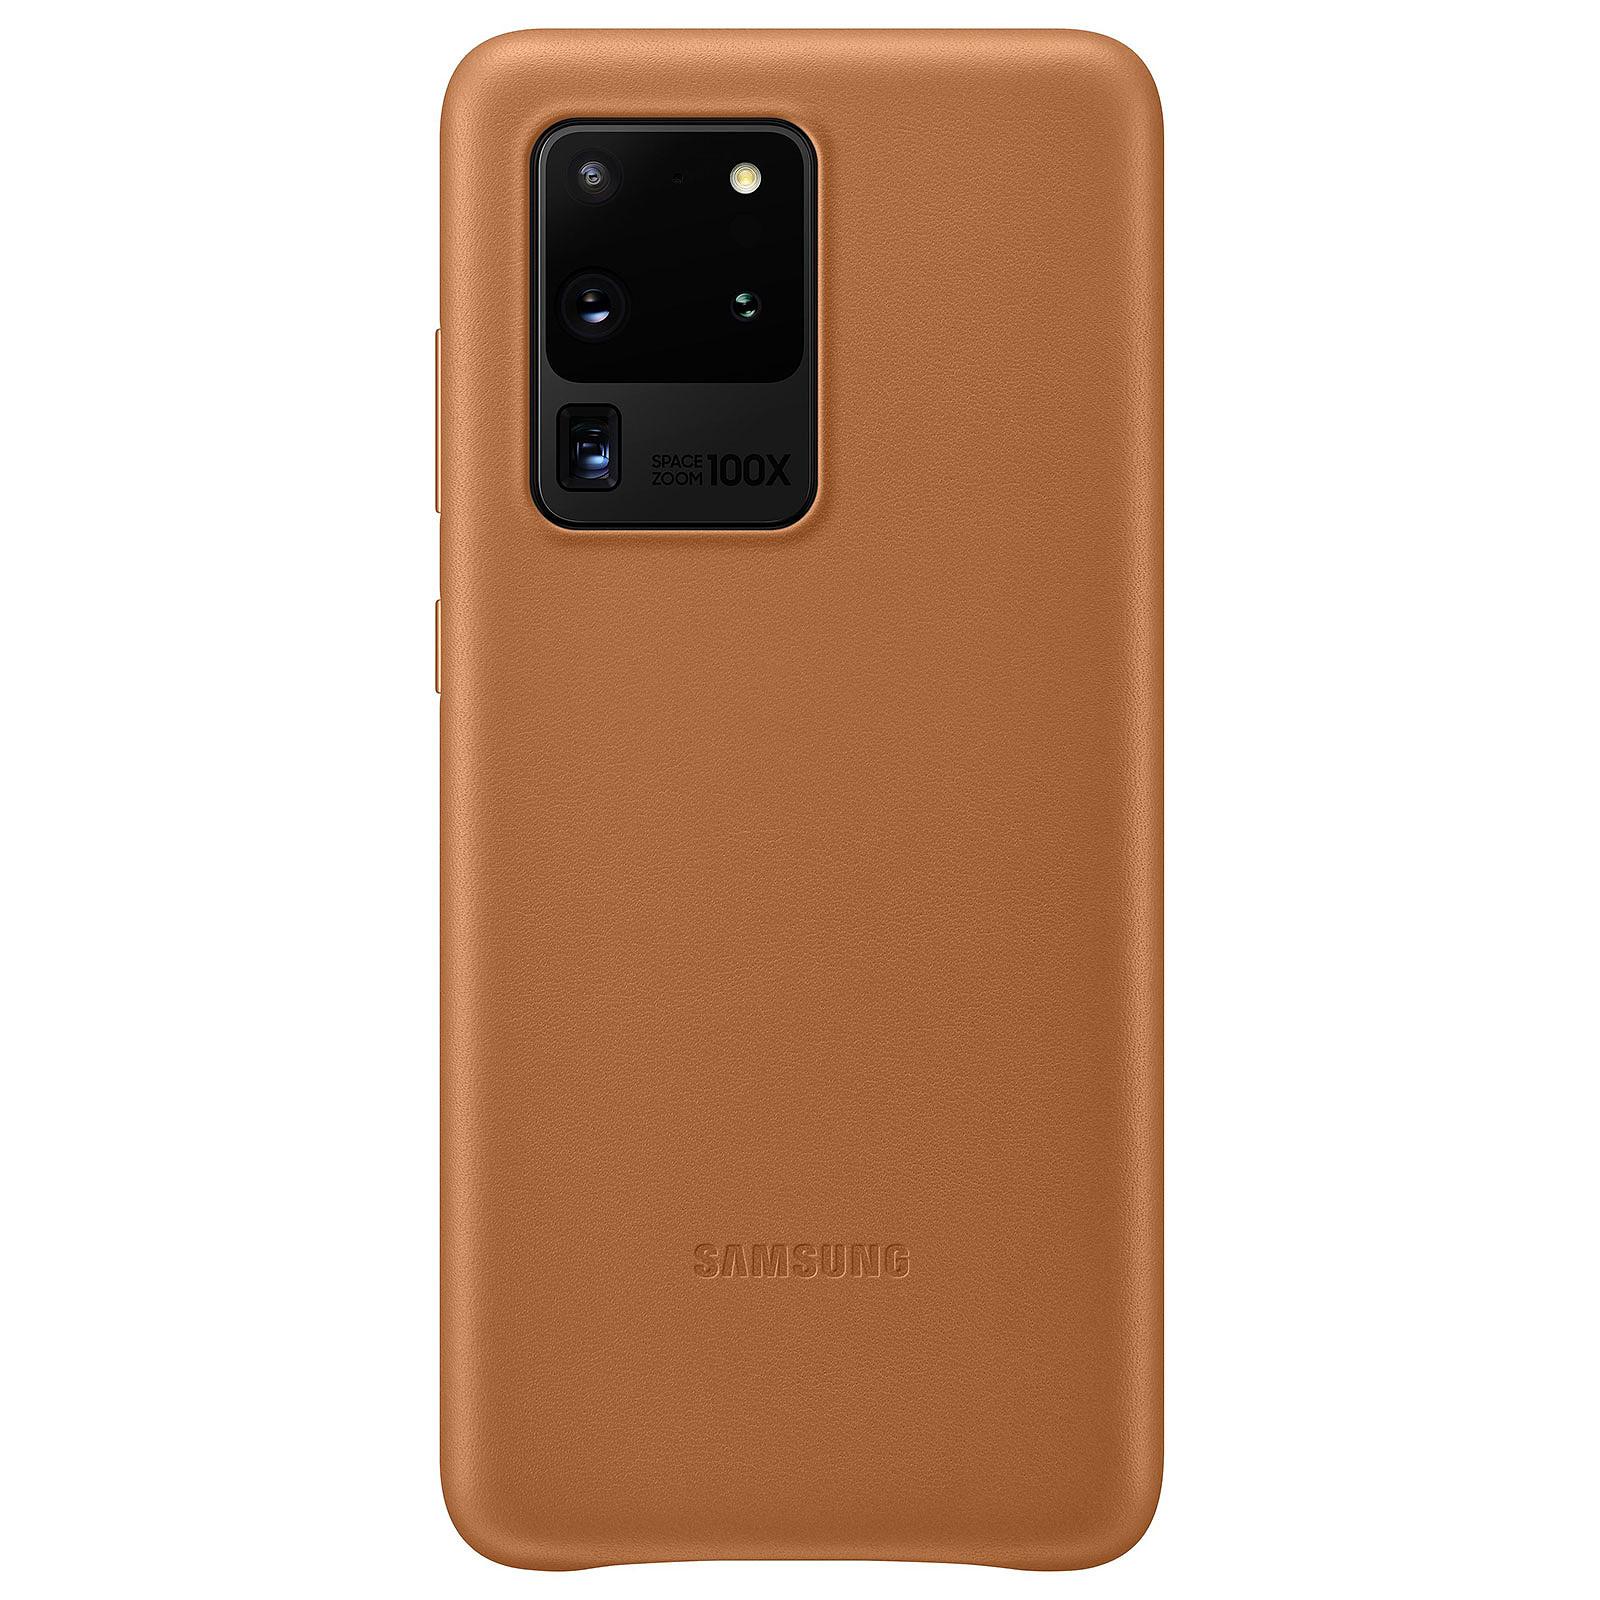 Samsung Coque Cuir Marron Samsung Galaxy S20 Ultra